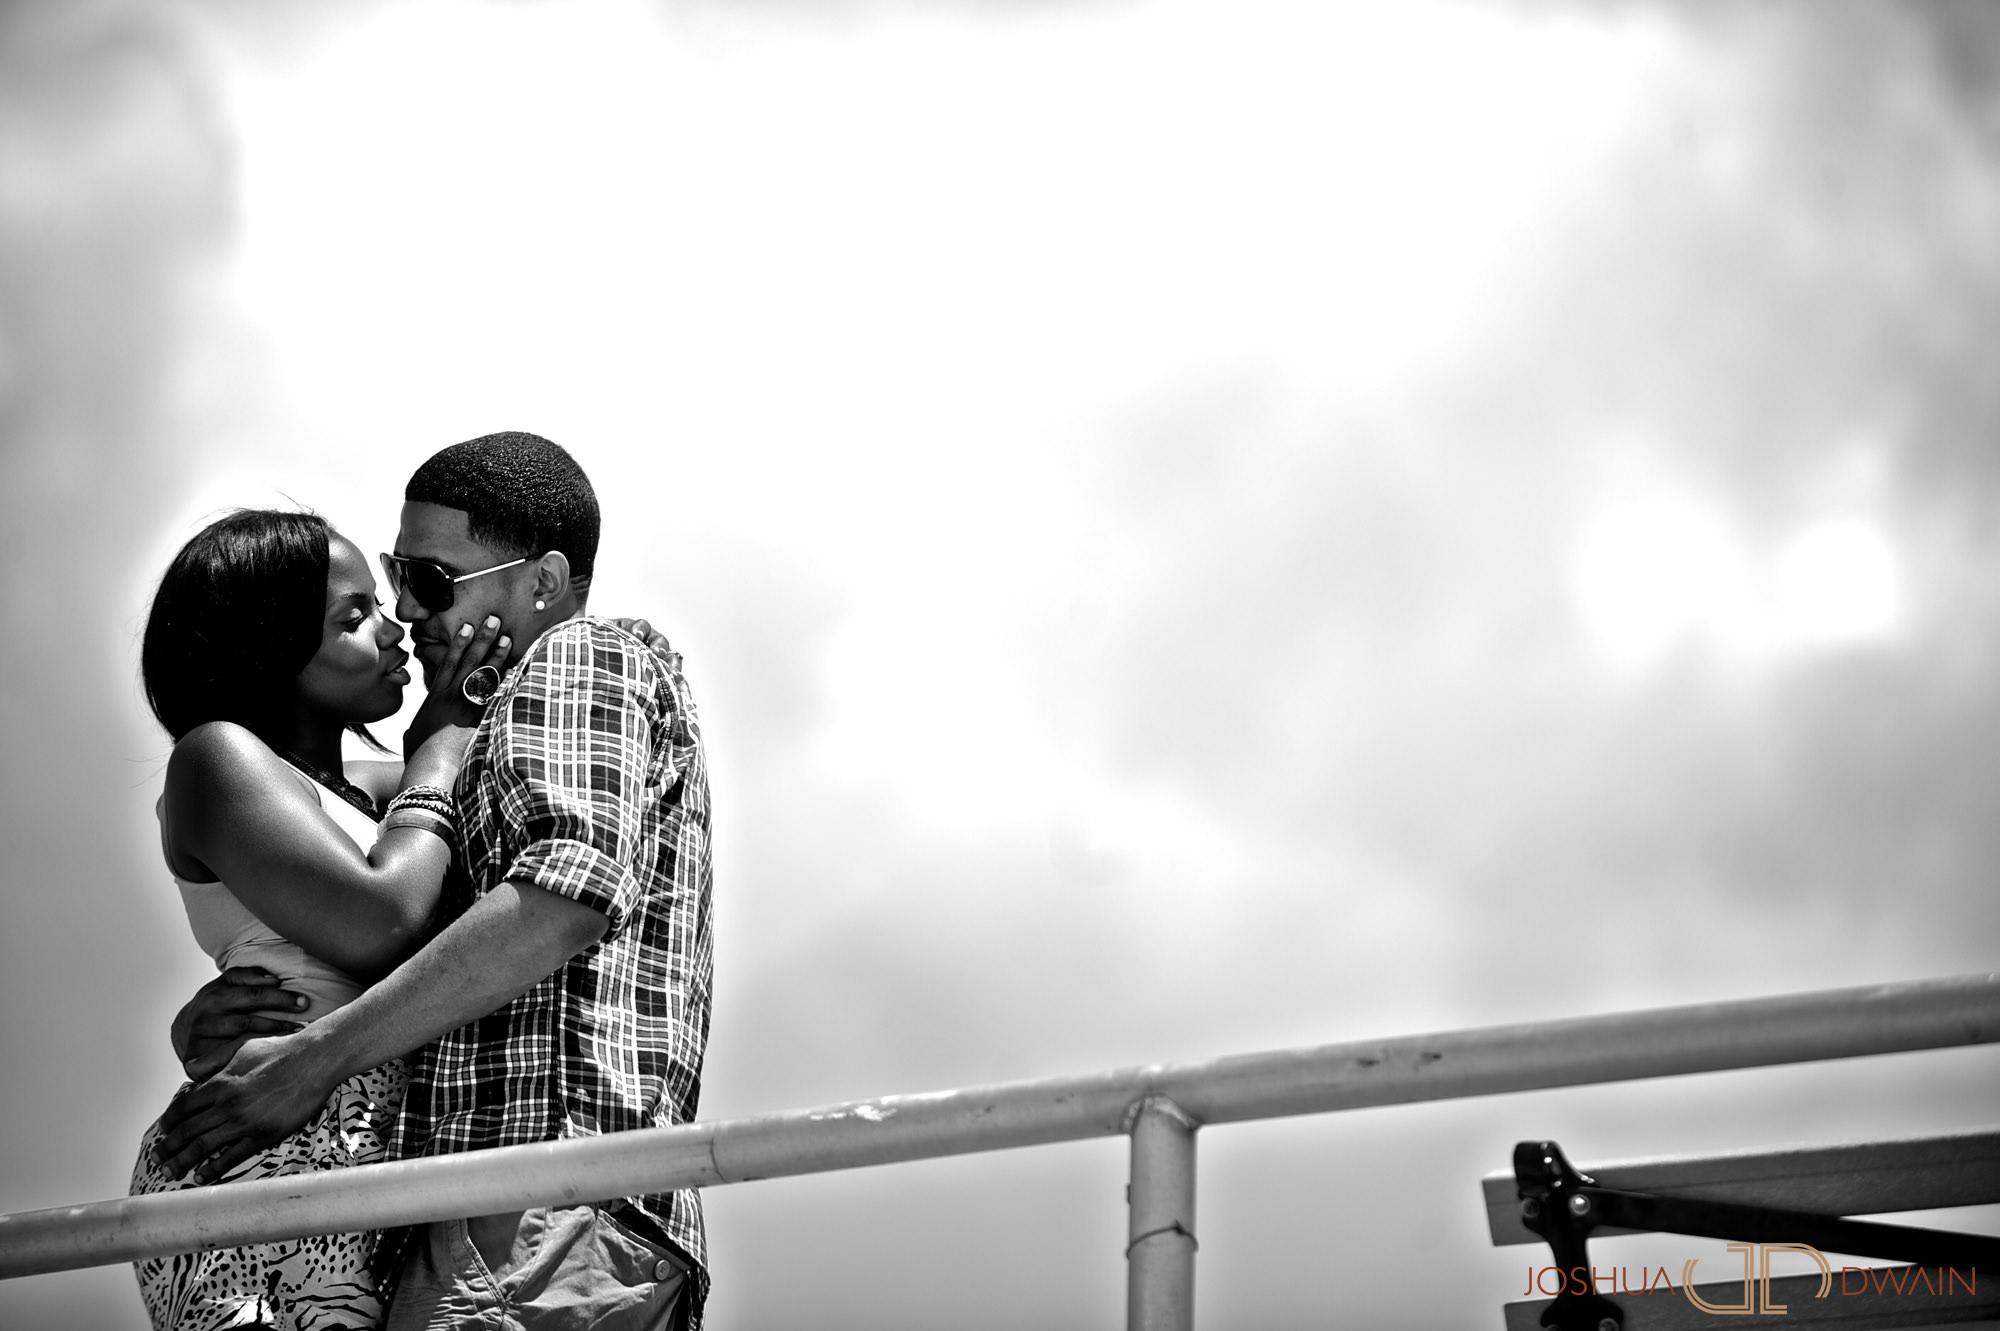 lucette-stephen-005-coney-island-brooklyn-ny-engagement-photographer-joshua-dwain-2011-07-02_ls_042